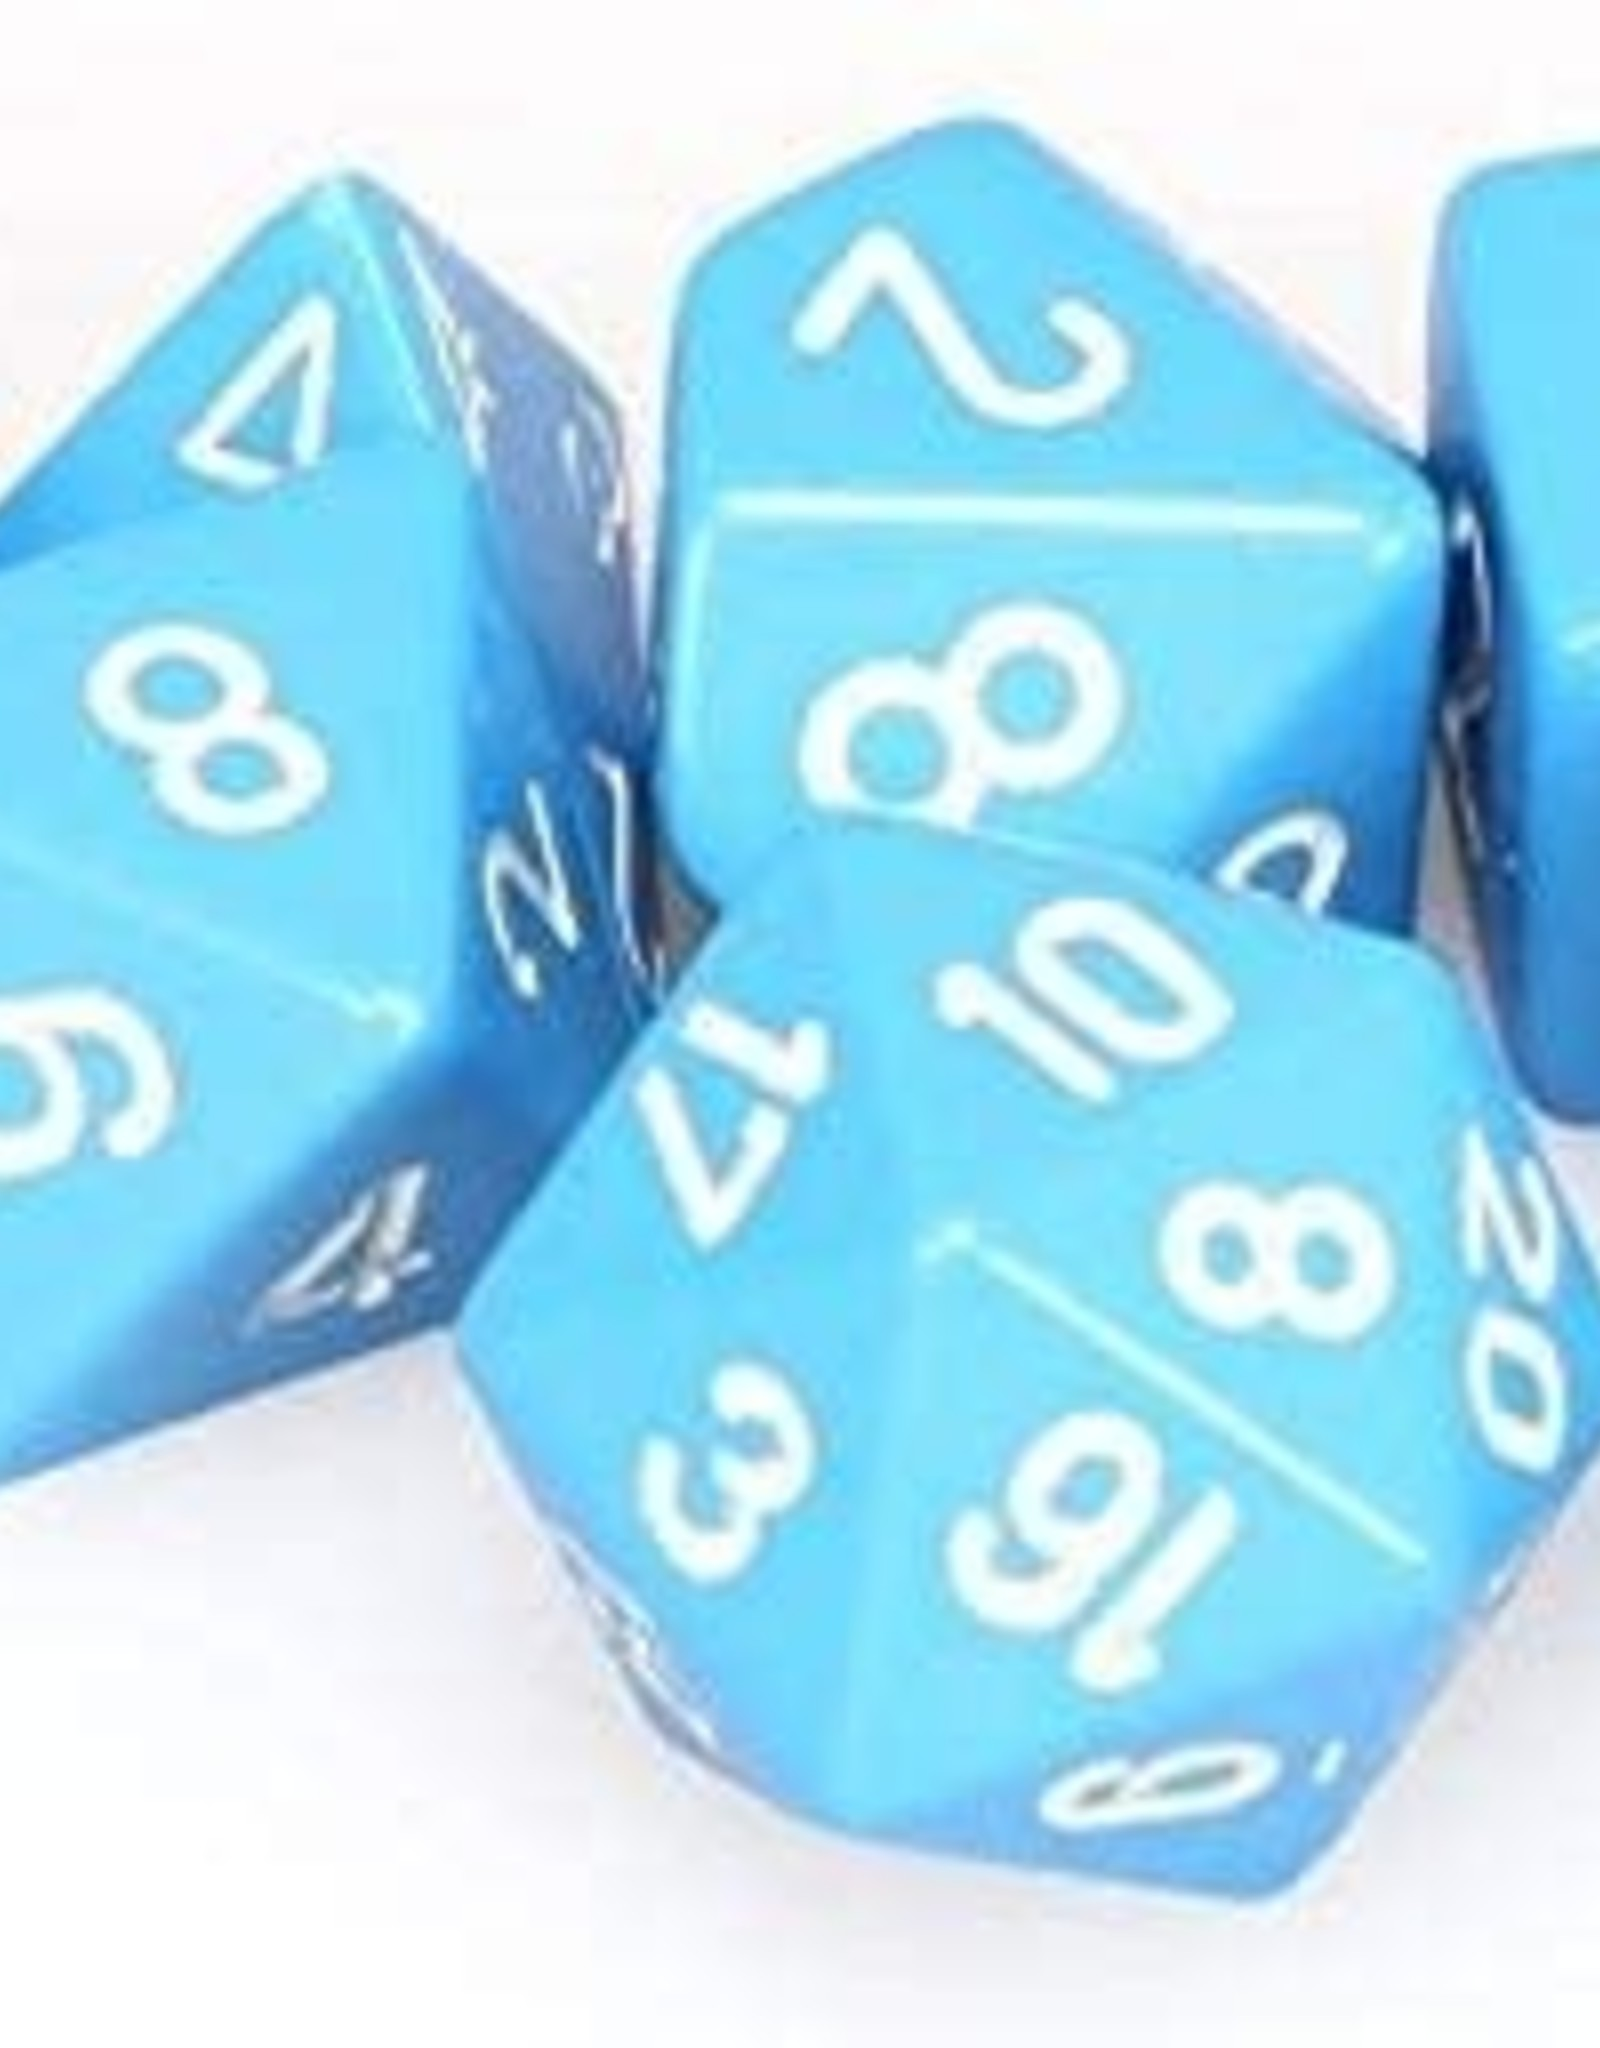 Chessex Chessex CHX25416 Dice-Opaque Light Blue/White Set